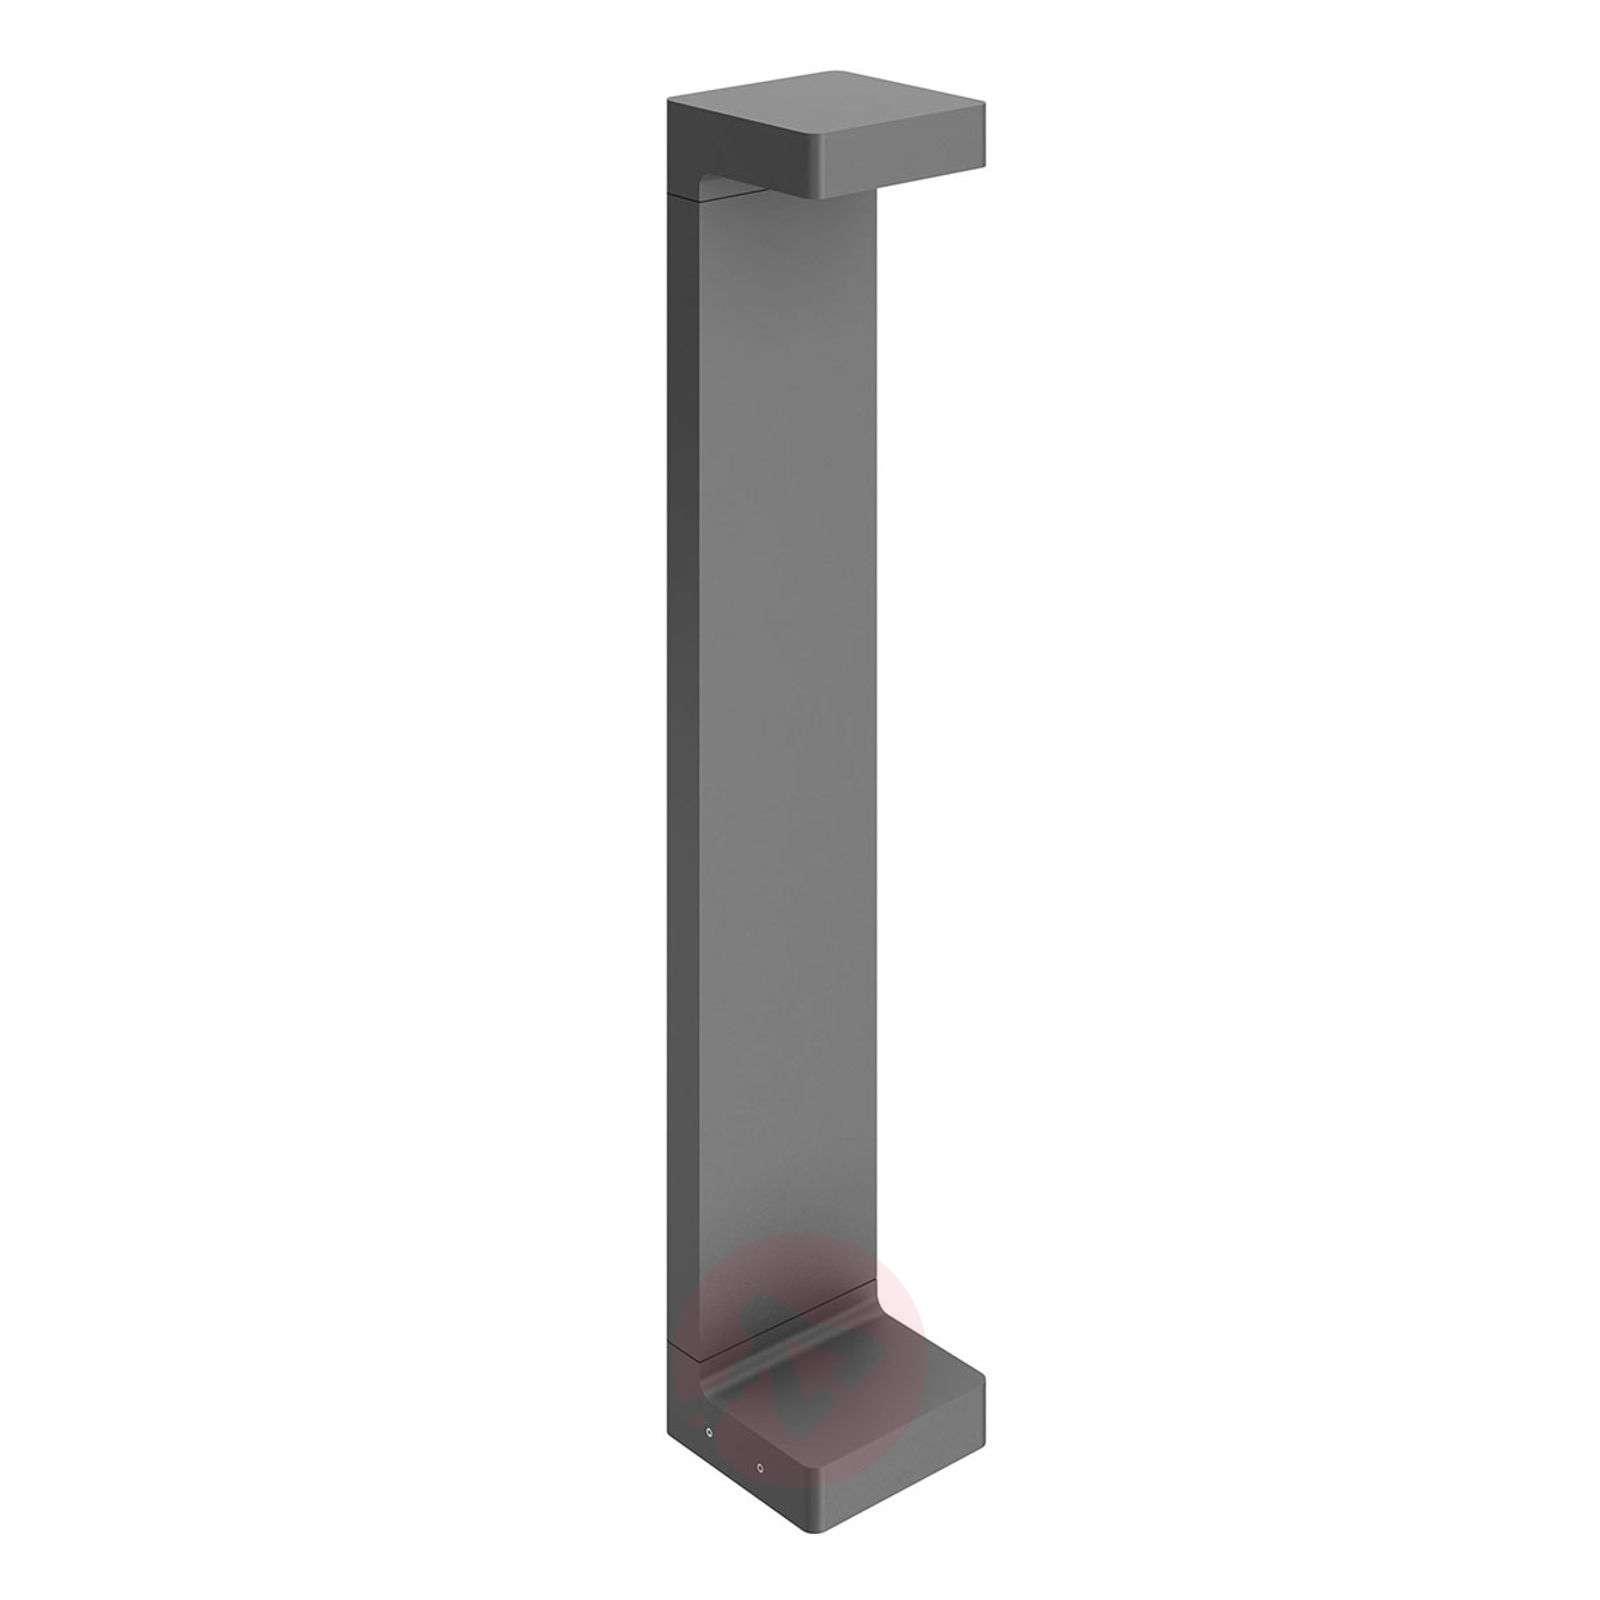 FLOS Casting C150 LED-pylväsvalaisin, 85cm-3510388X-01